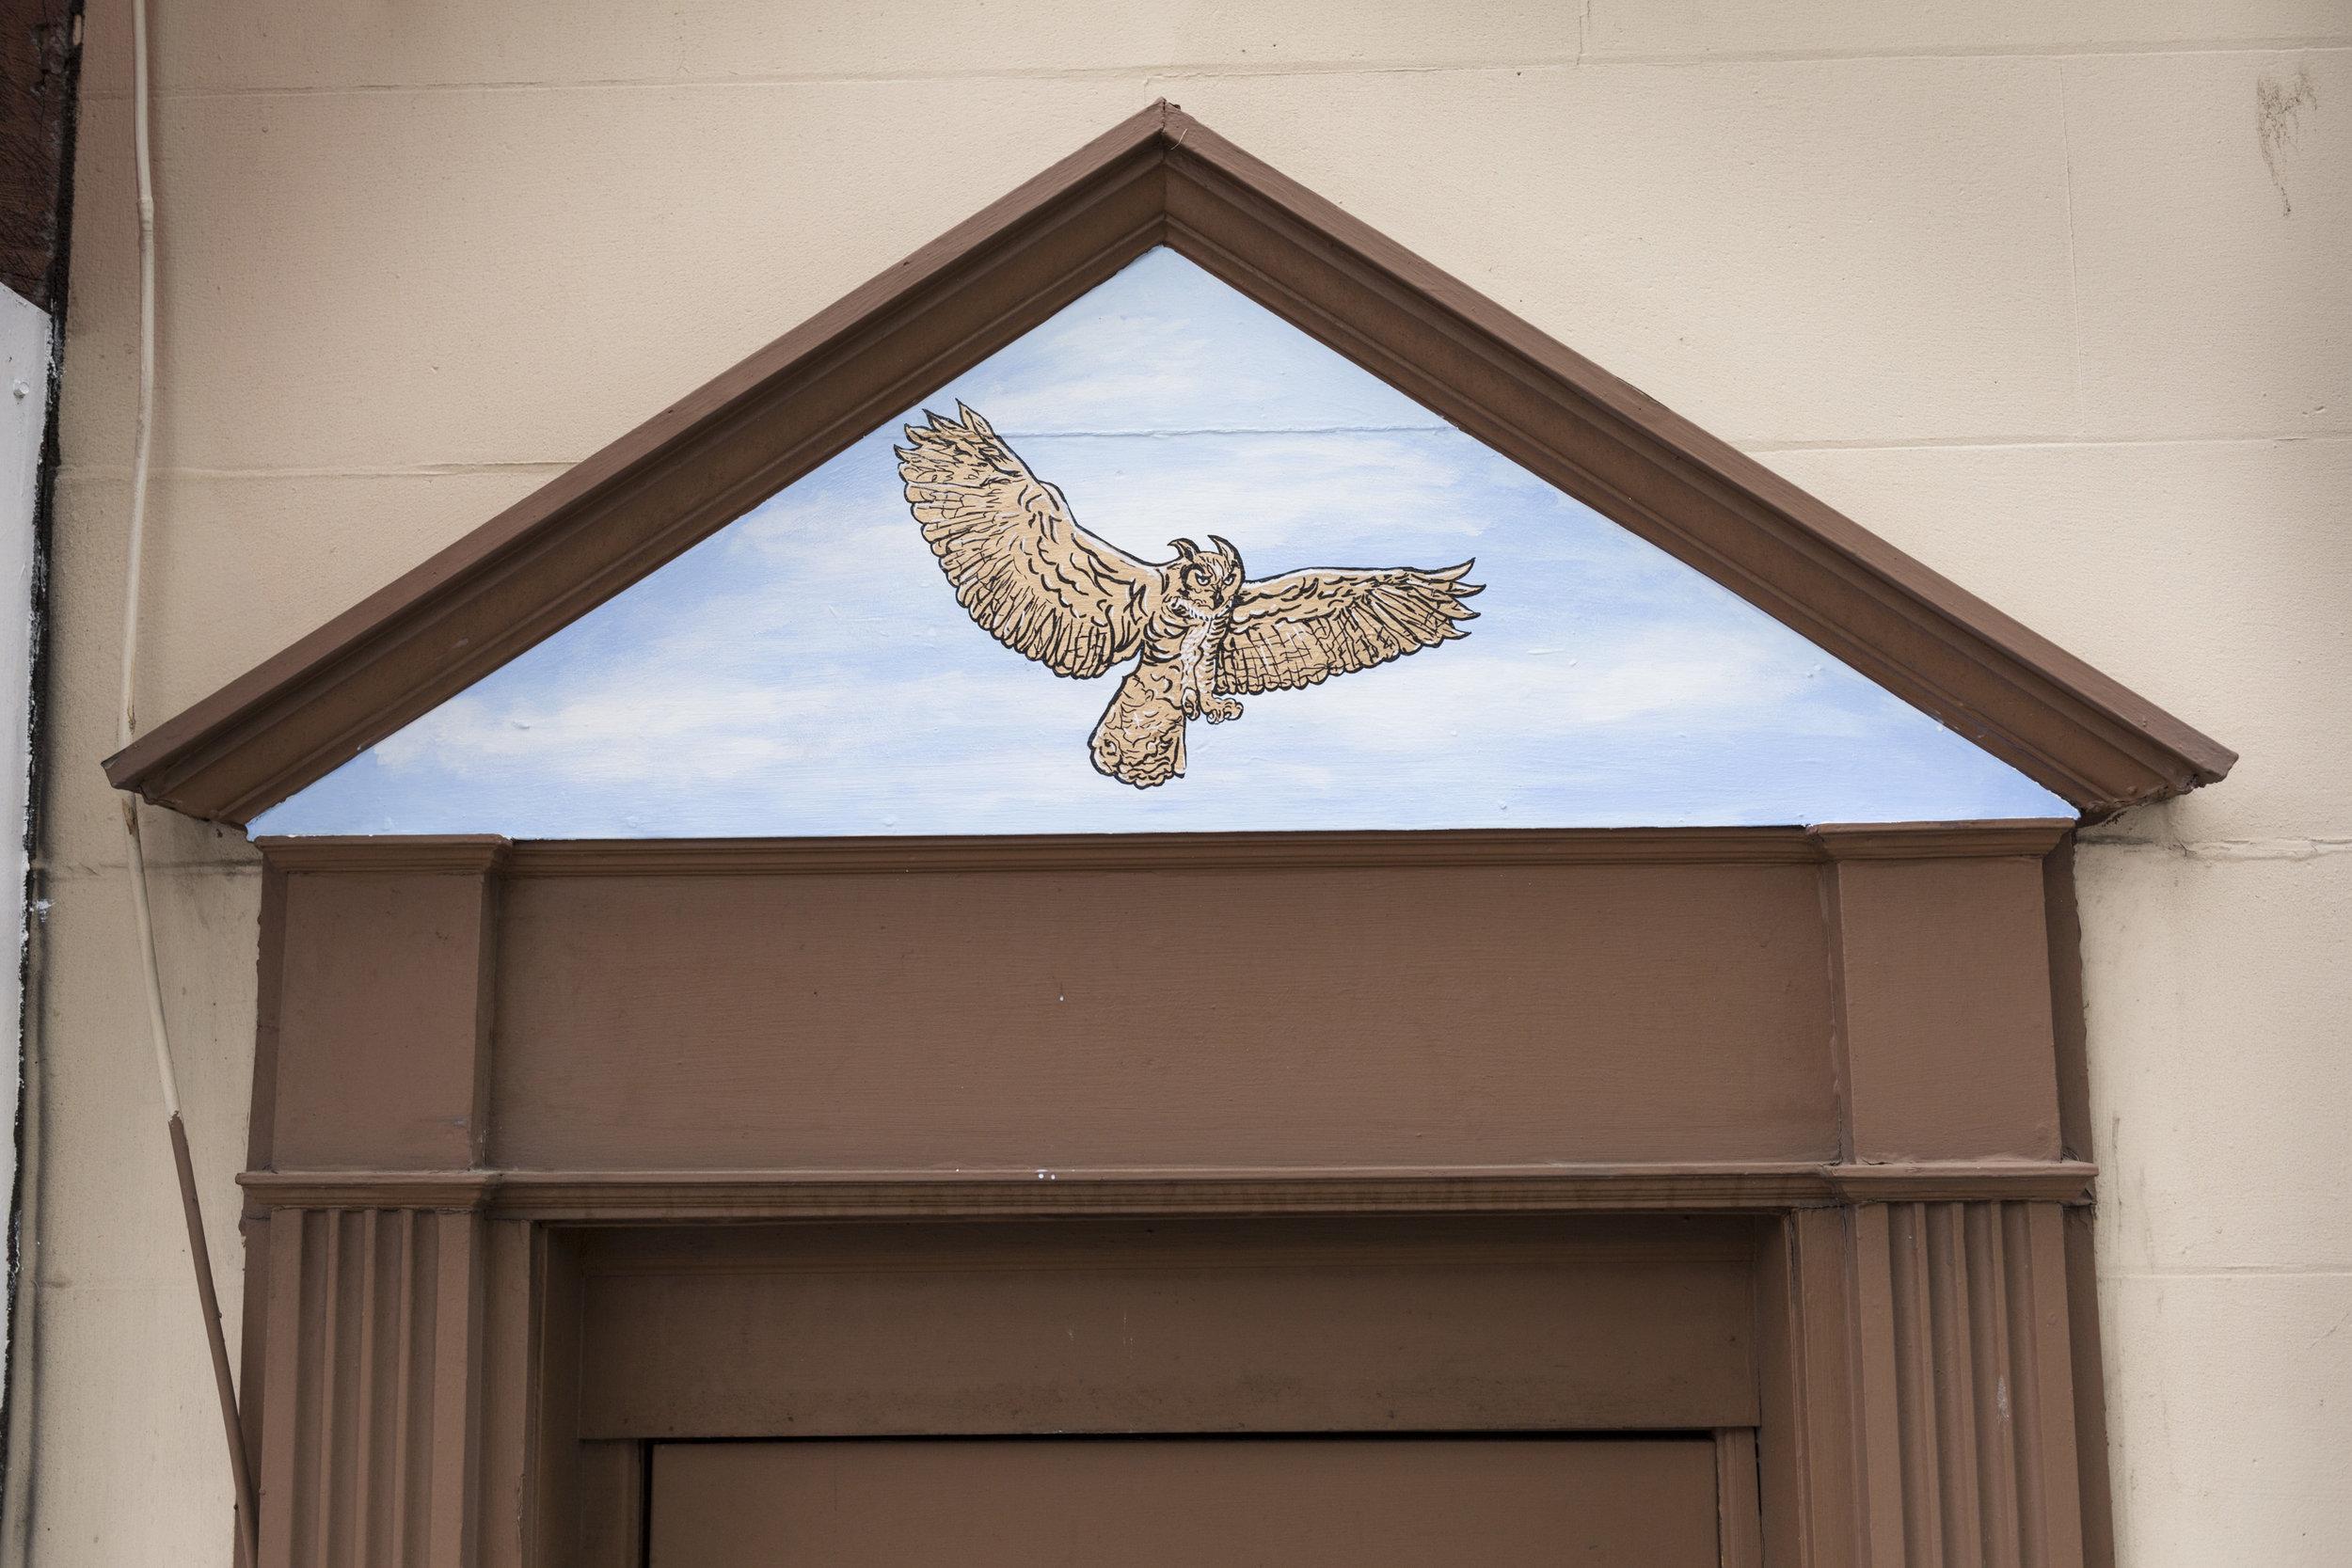 Legal Aviary (DETAIL)